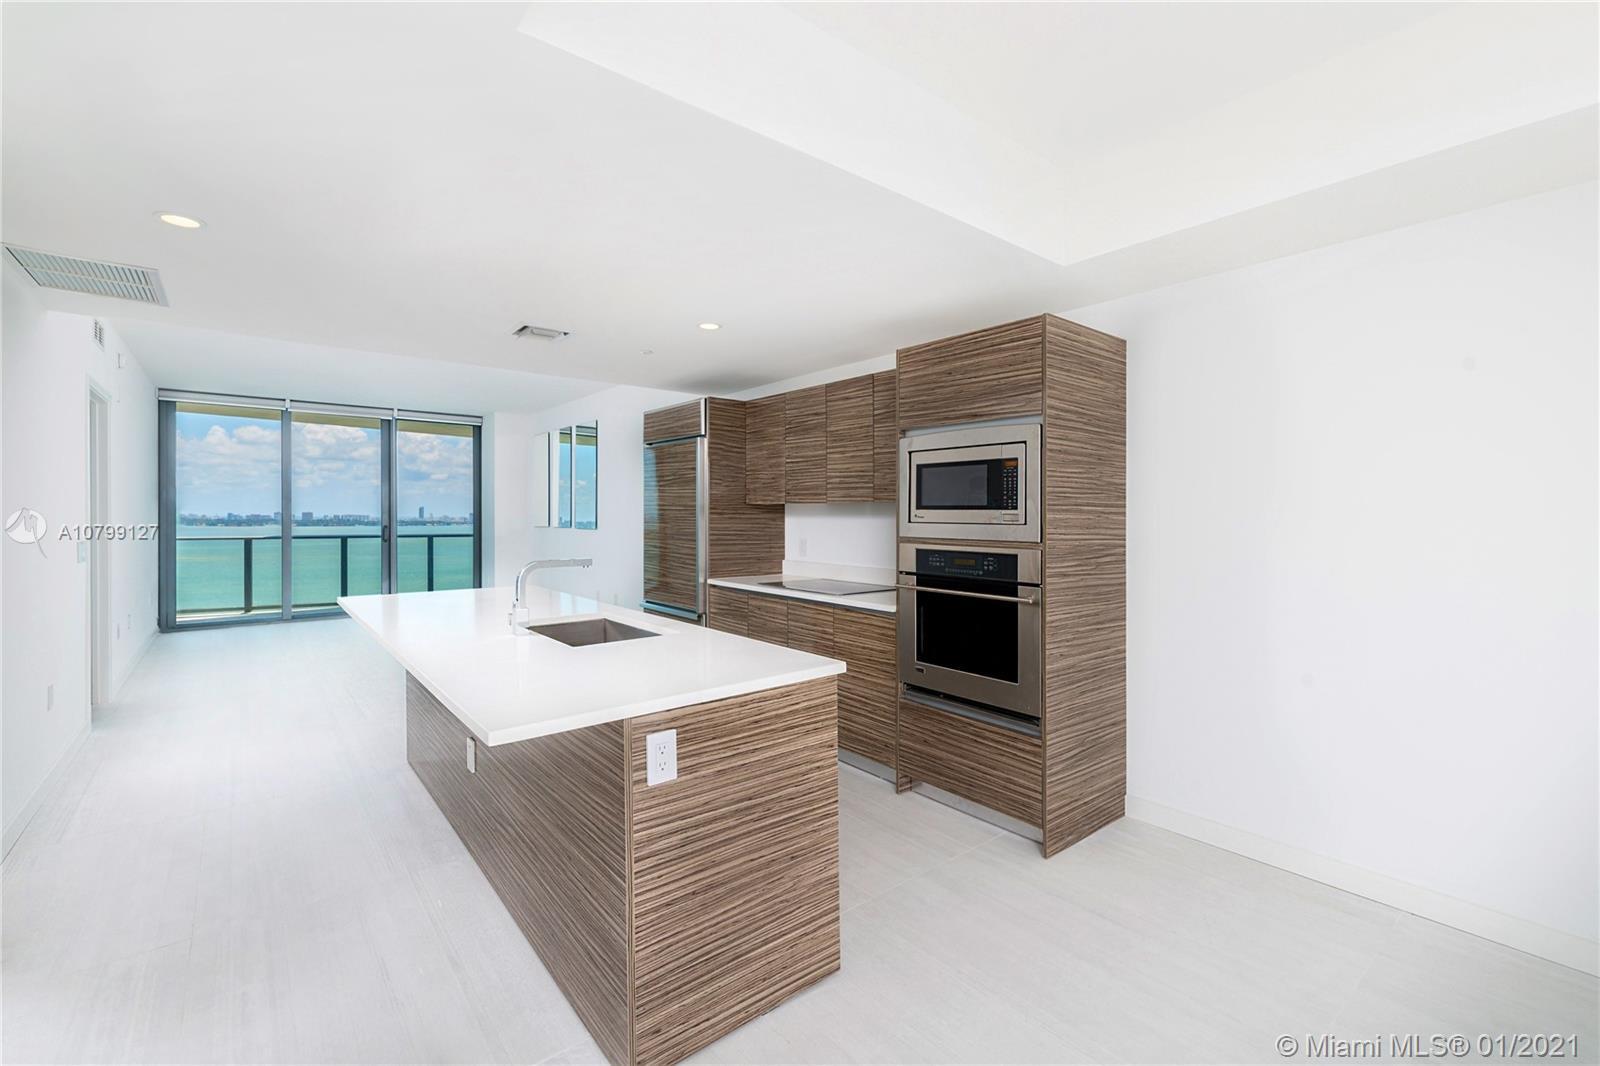 460 NE 28th St, 2107 - Miami, Florida